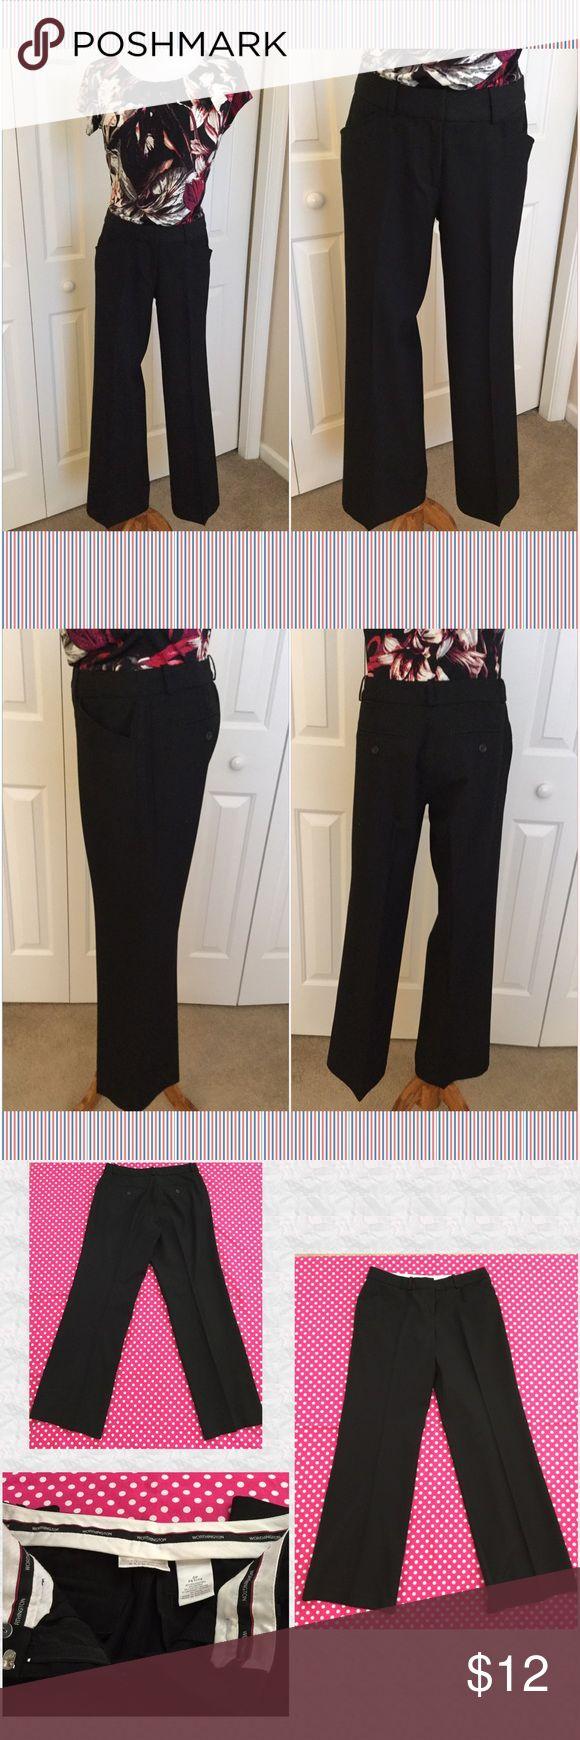 "Worthington Black Dress Slacks Worthington black dress slacks.  Inseam is 30"".  Polyester/rayon/spandex blend.  Well kept and like new condition. Worthington Pants Trousers"